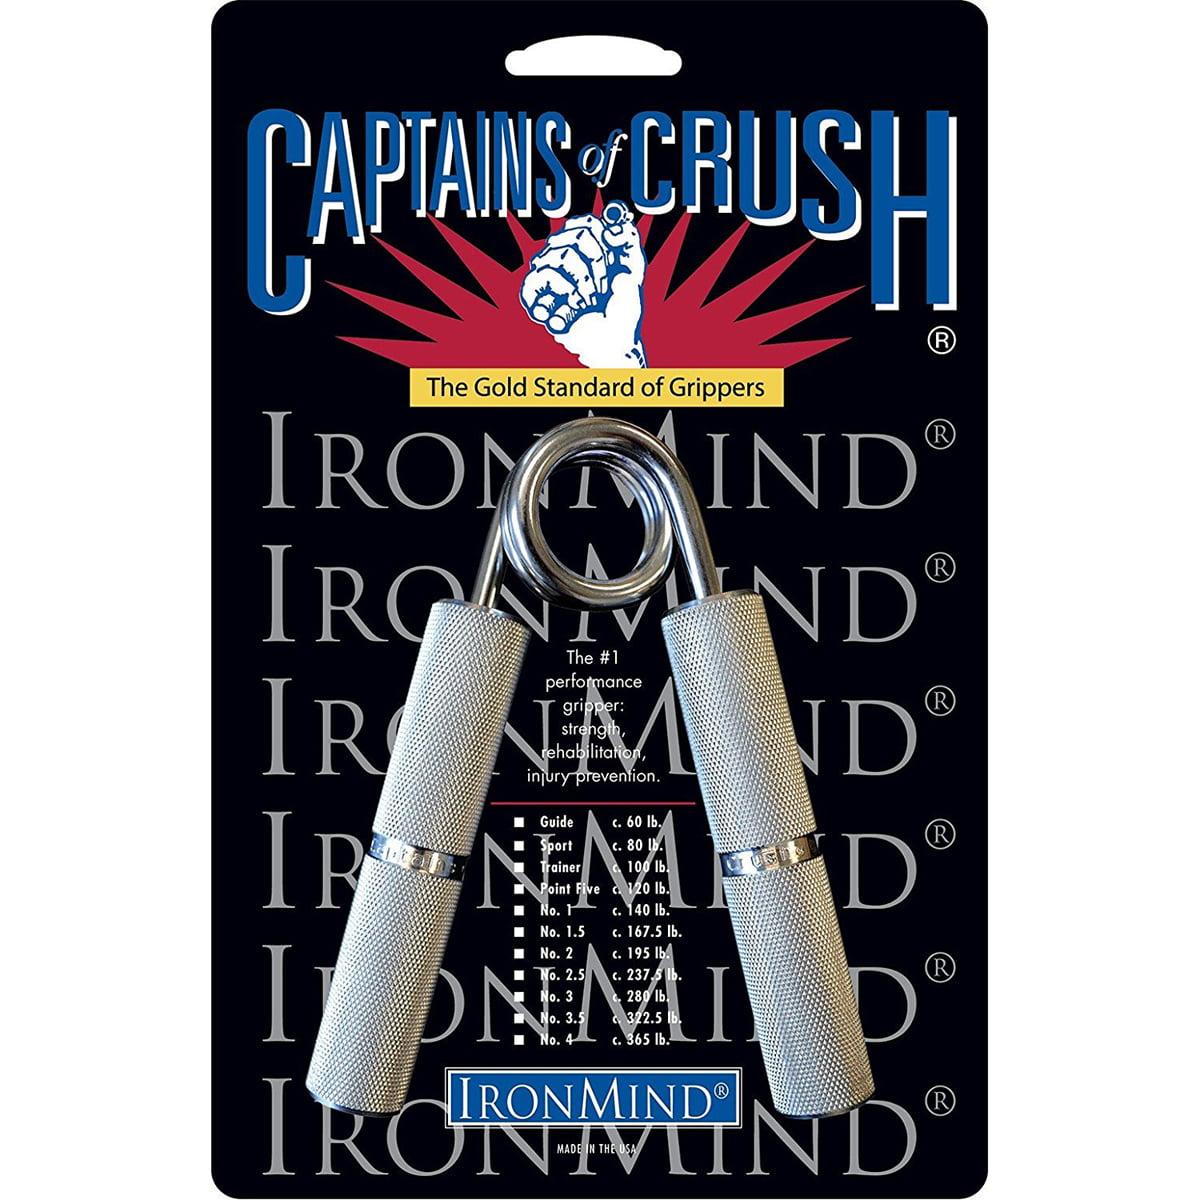 Captains of Crush Hand Gripper No. 1 - (140 lb)